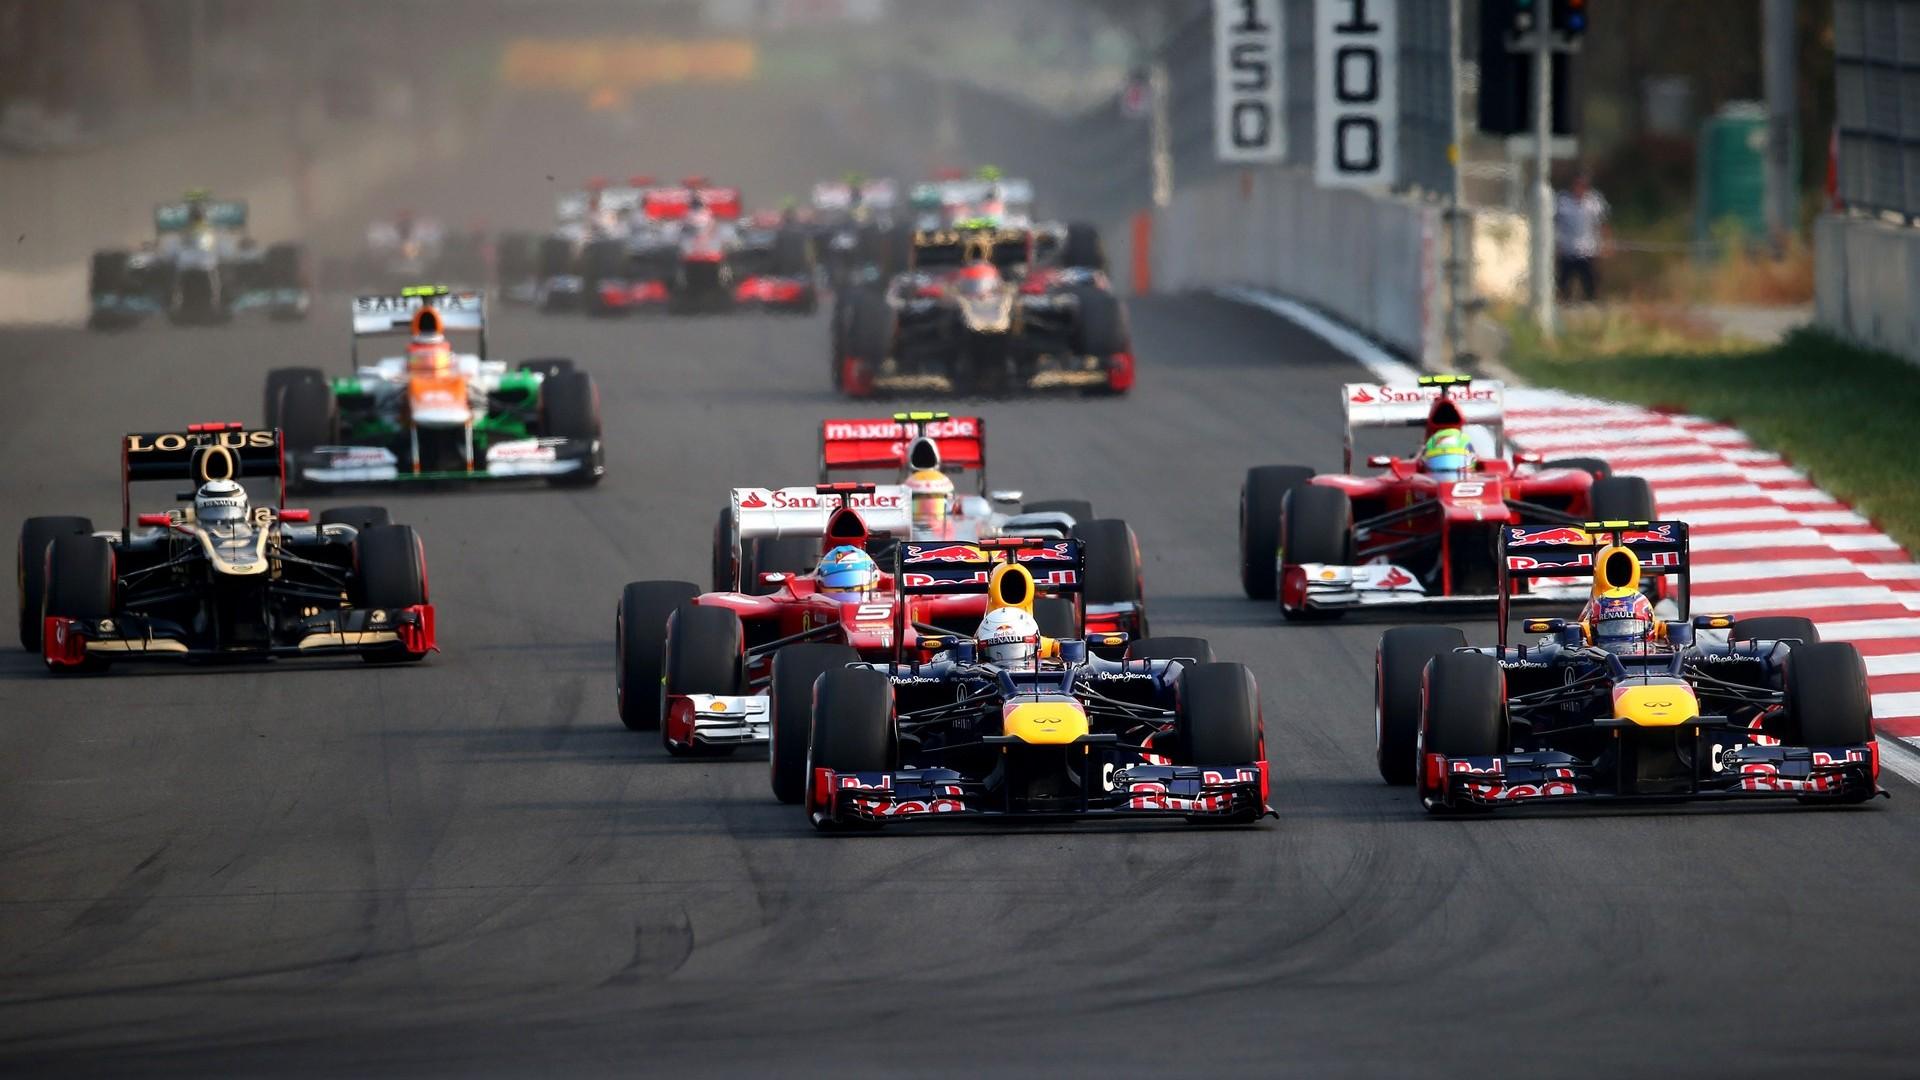 Free download HD Wallpapers 2012 Formula 1 Grand Prix of ...